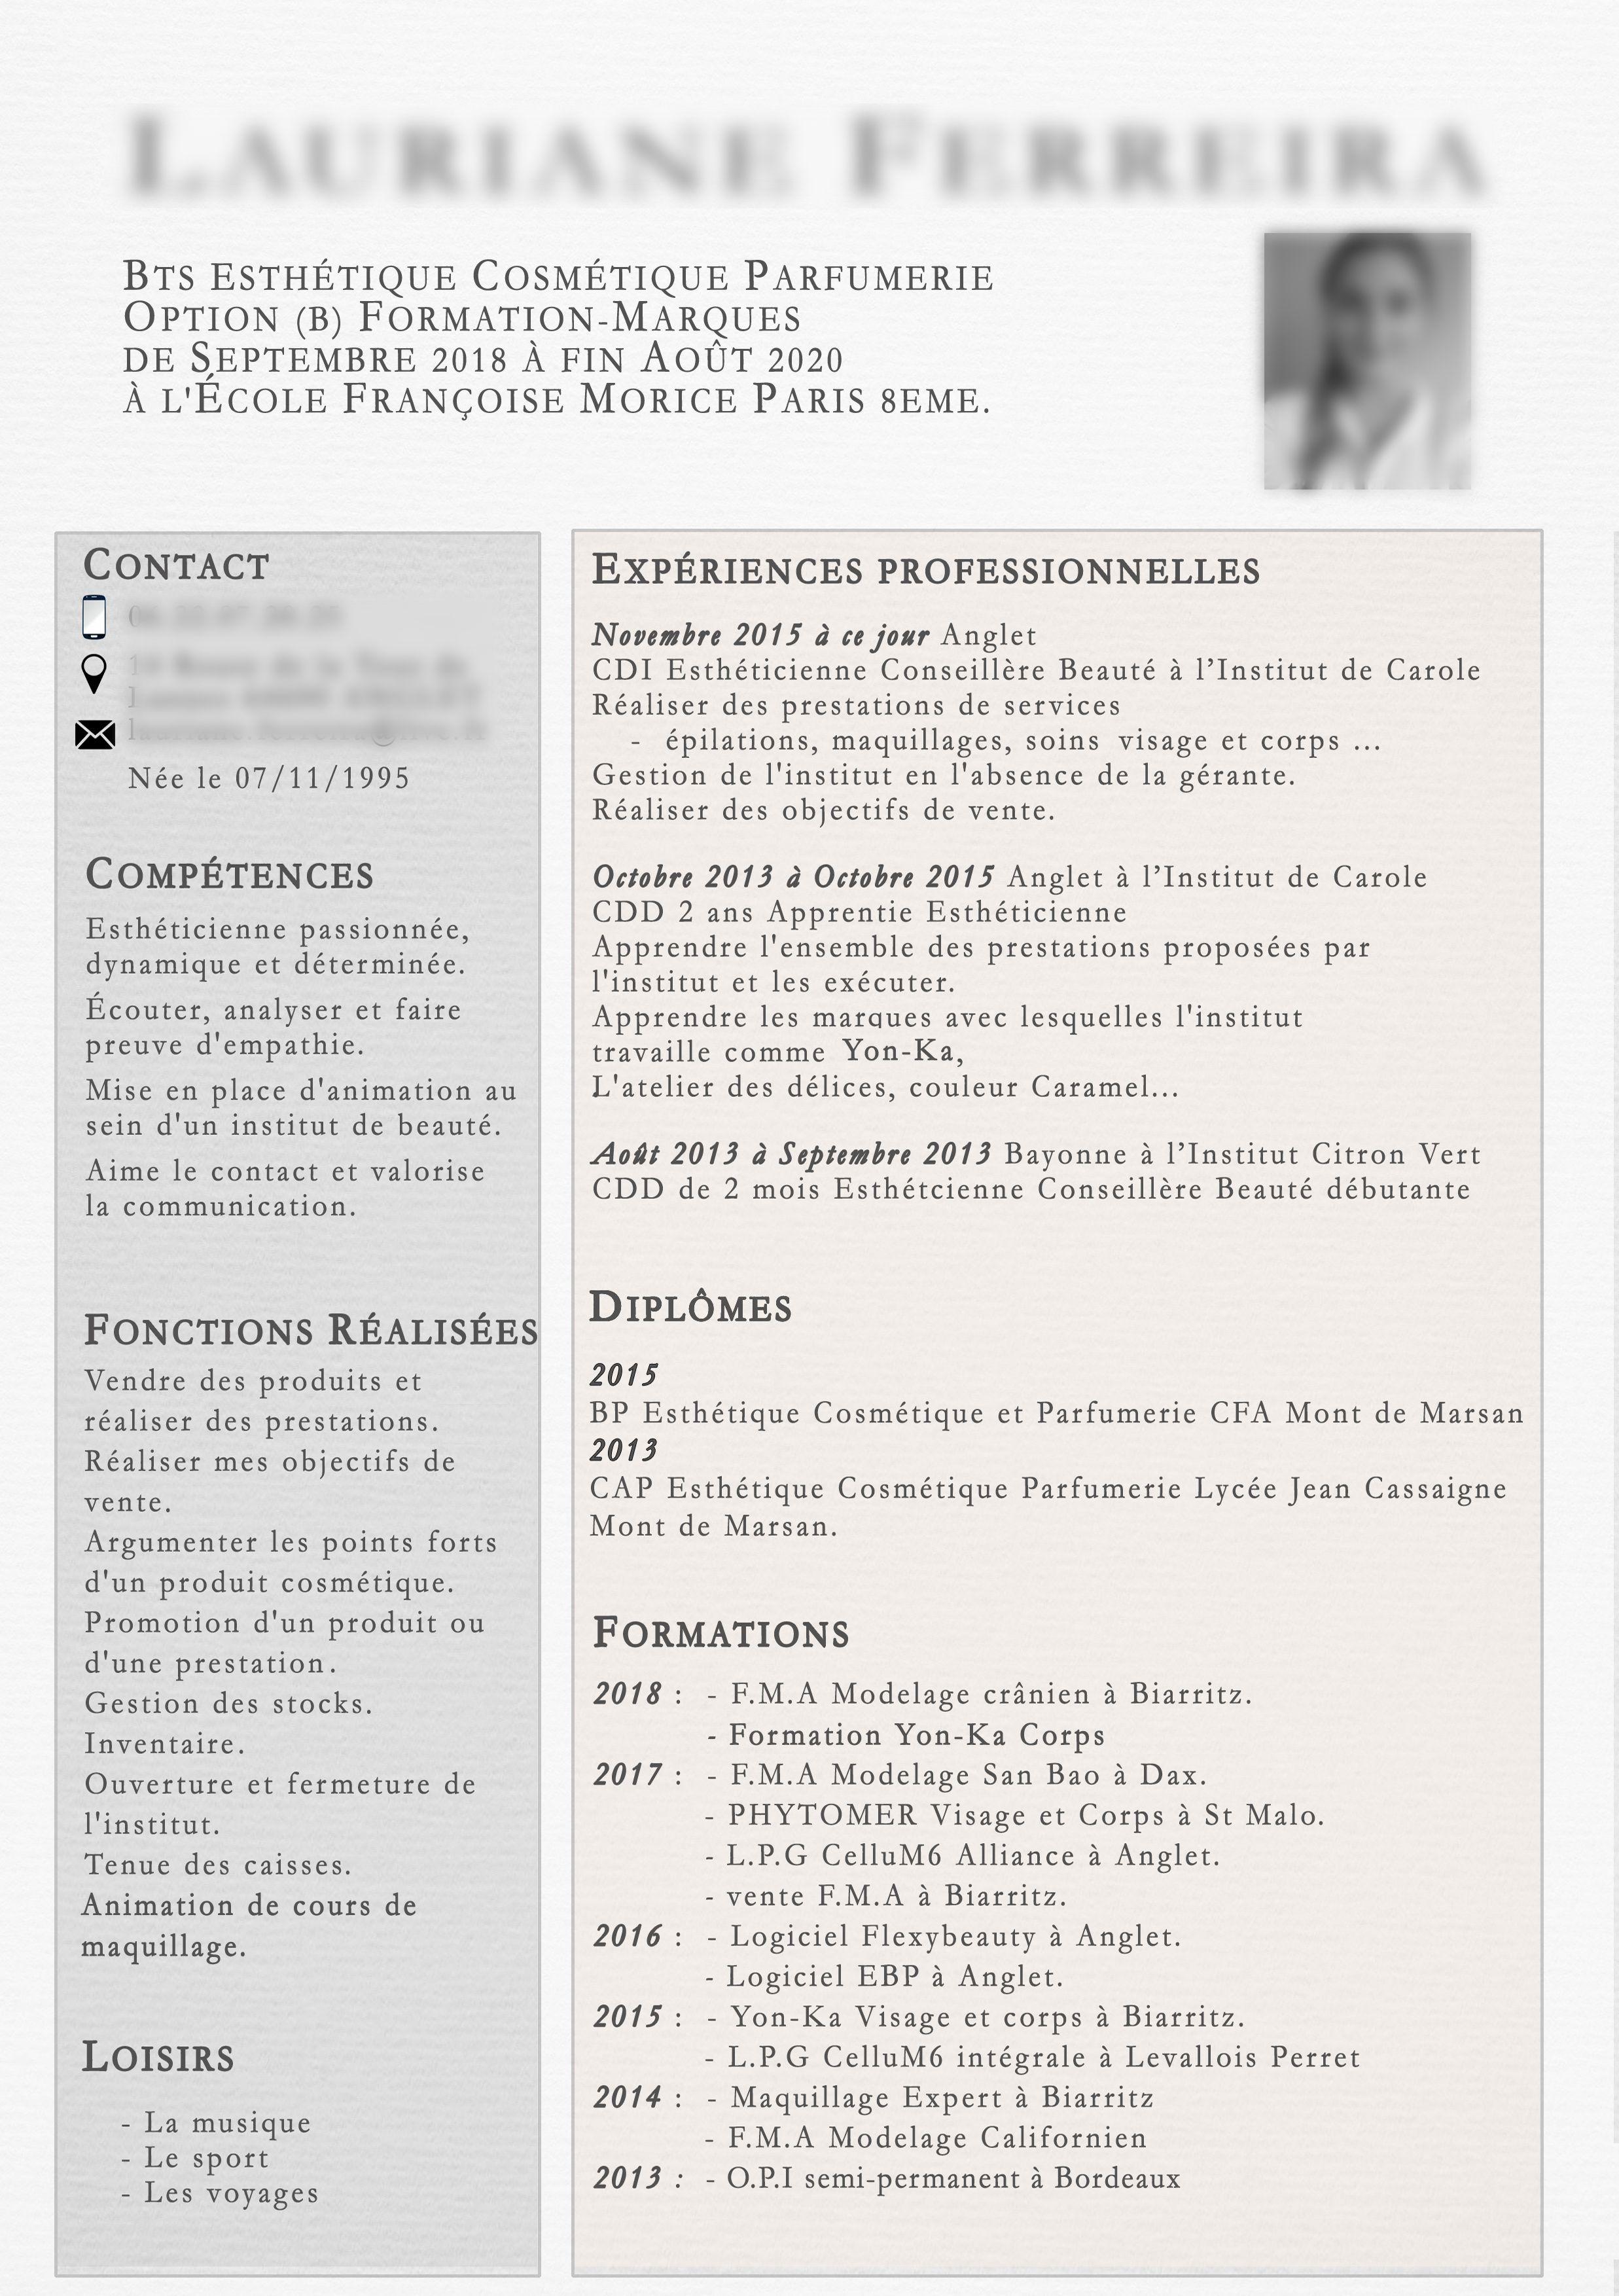 Creation Cv Bts Estheticienne Creation Franck Laforest Estheticienne Creation Cv Soin Visage